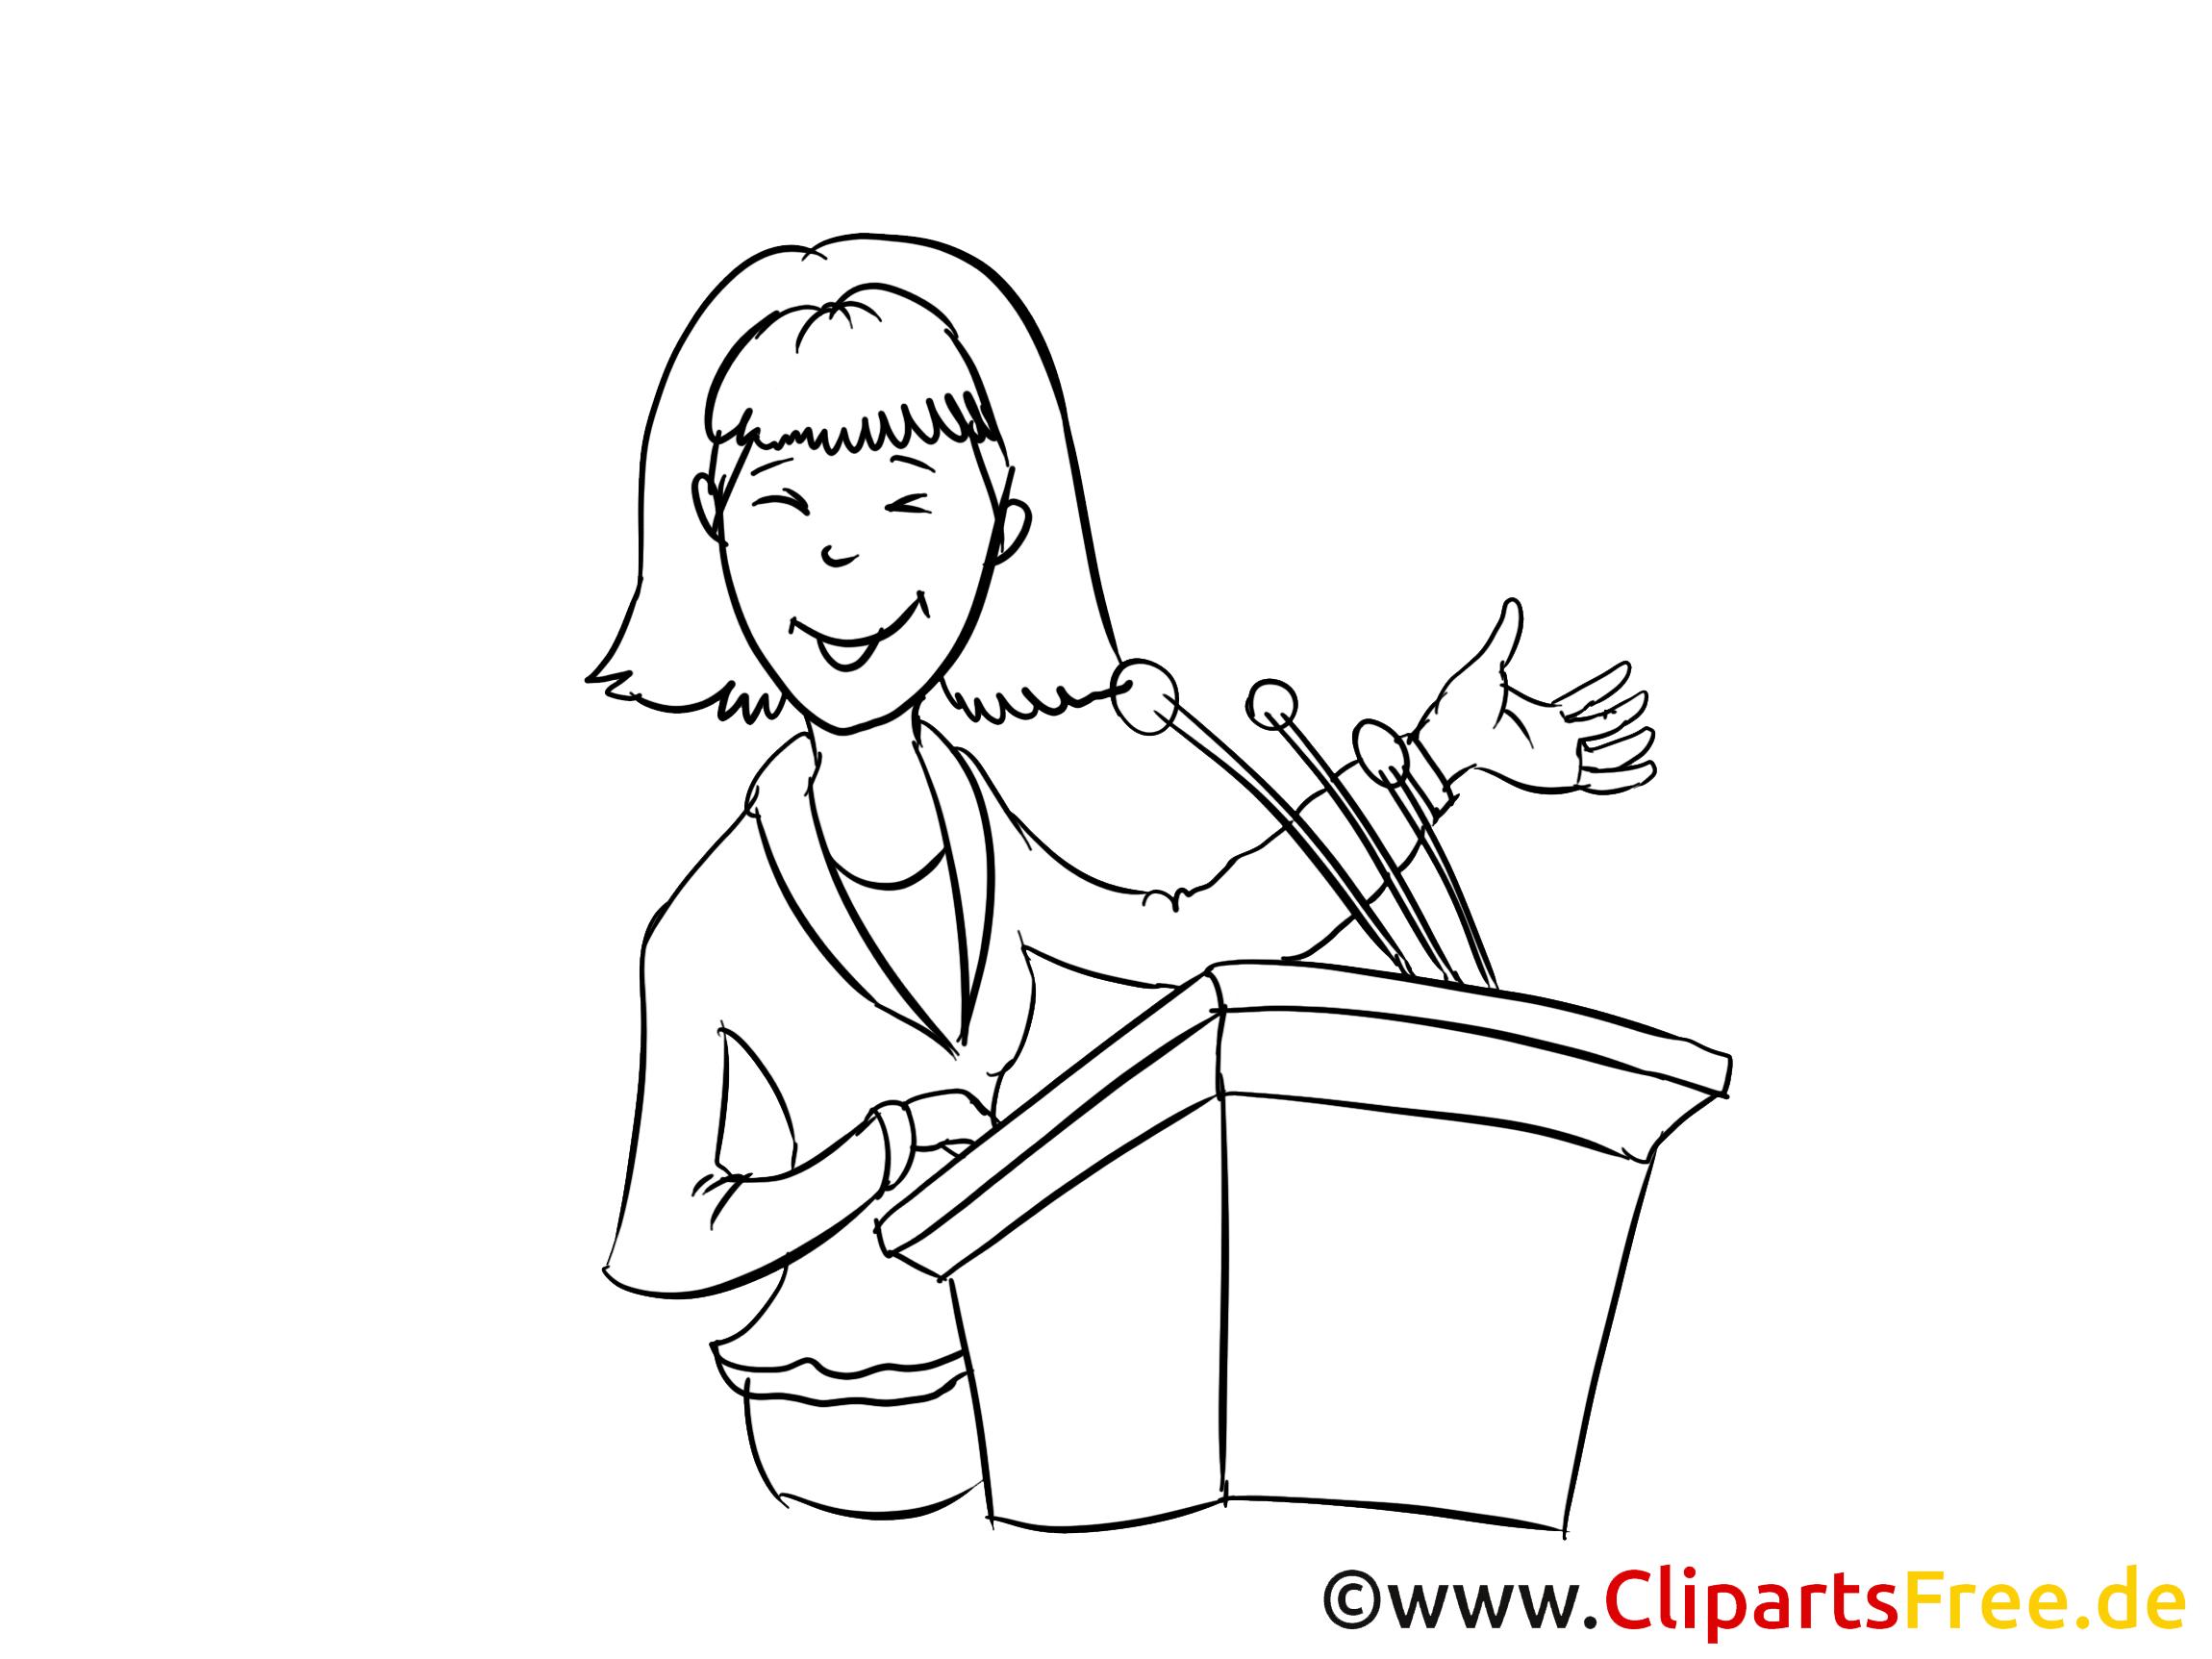 Junge frau clipart png freeuse library Blonde junge Frau Clipart, Bild, Zeichnung, Cartoon png freeuse library